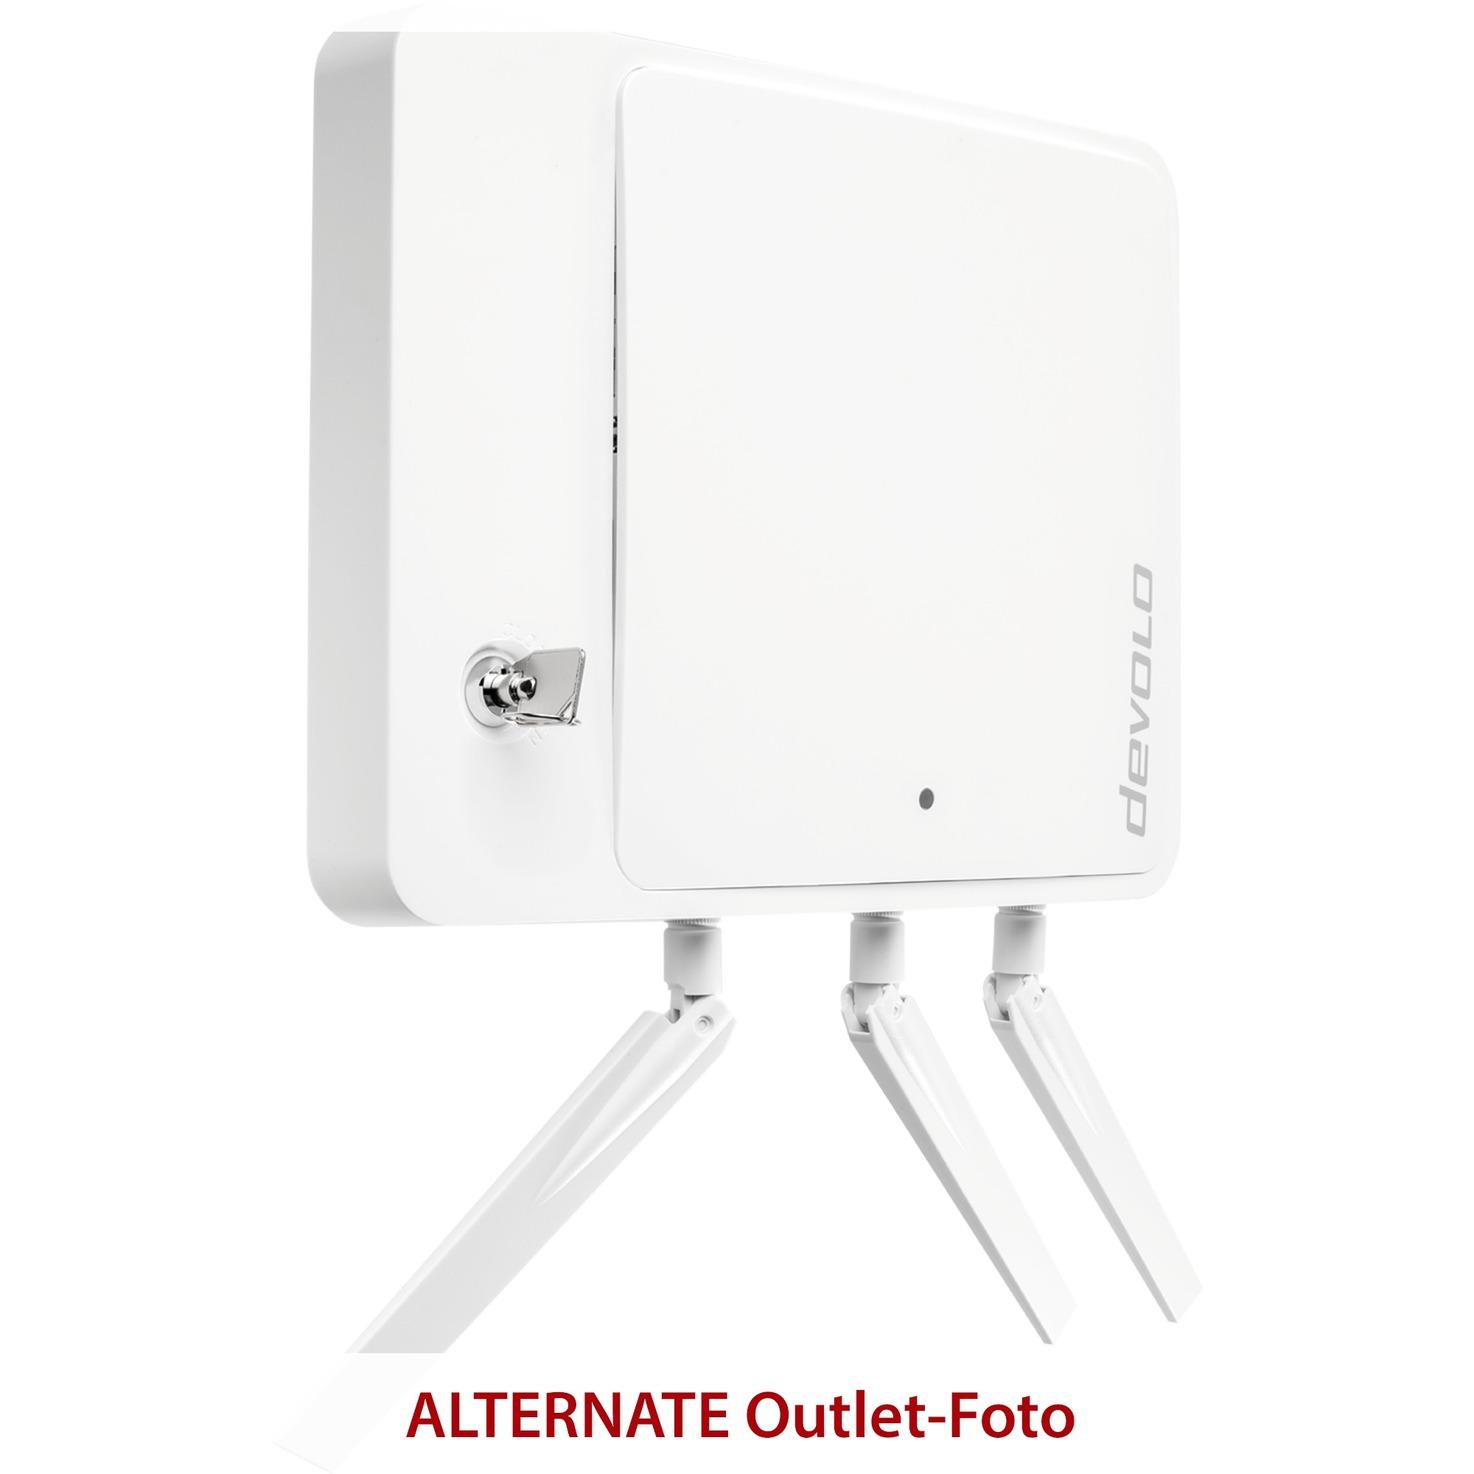 WM1 Color blanco equipo de red 3G UMTS, PowerLAN